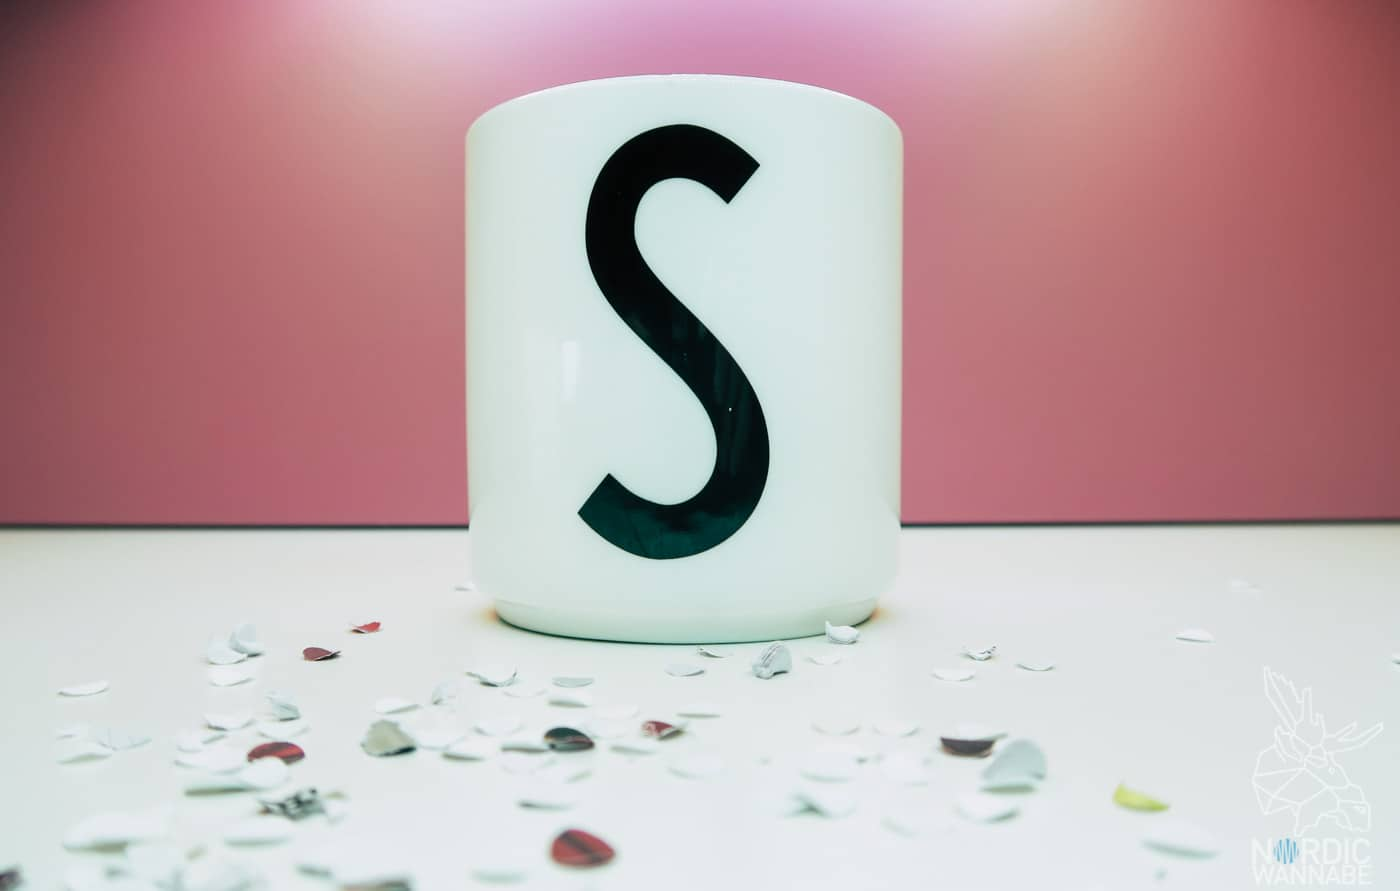 Design Letters, Arne Jacobsen, dänisches Geschirr, Becher, Tassen, Klassiker, dänisches Design